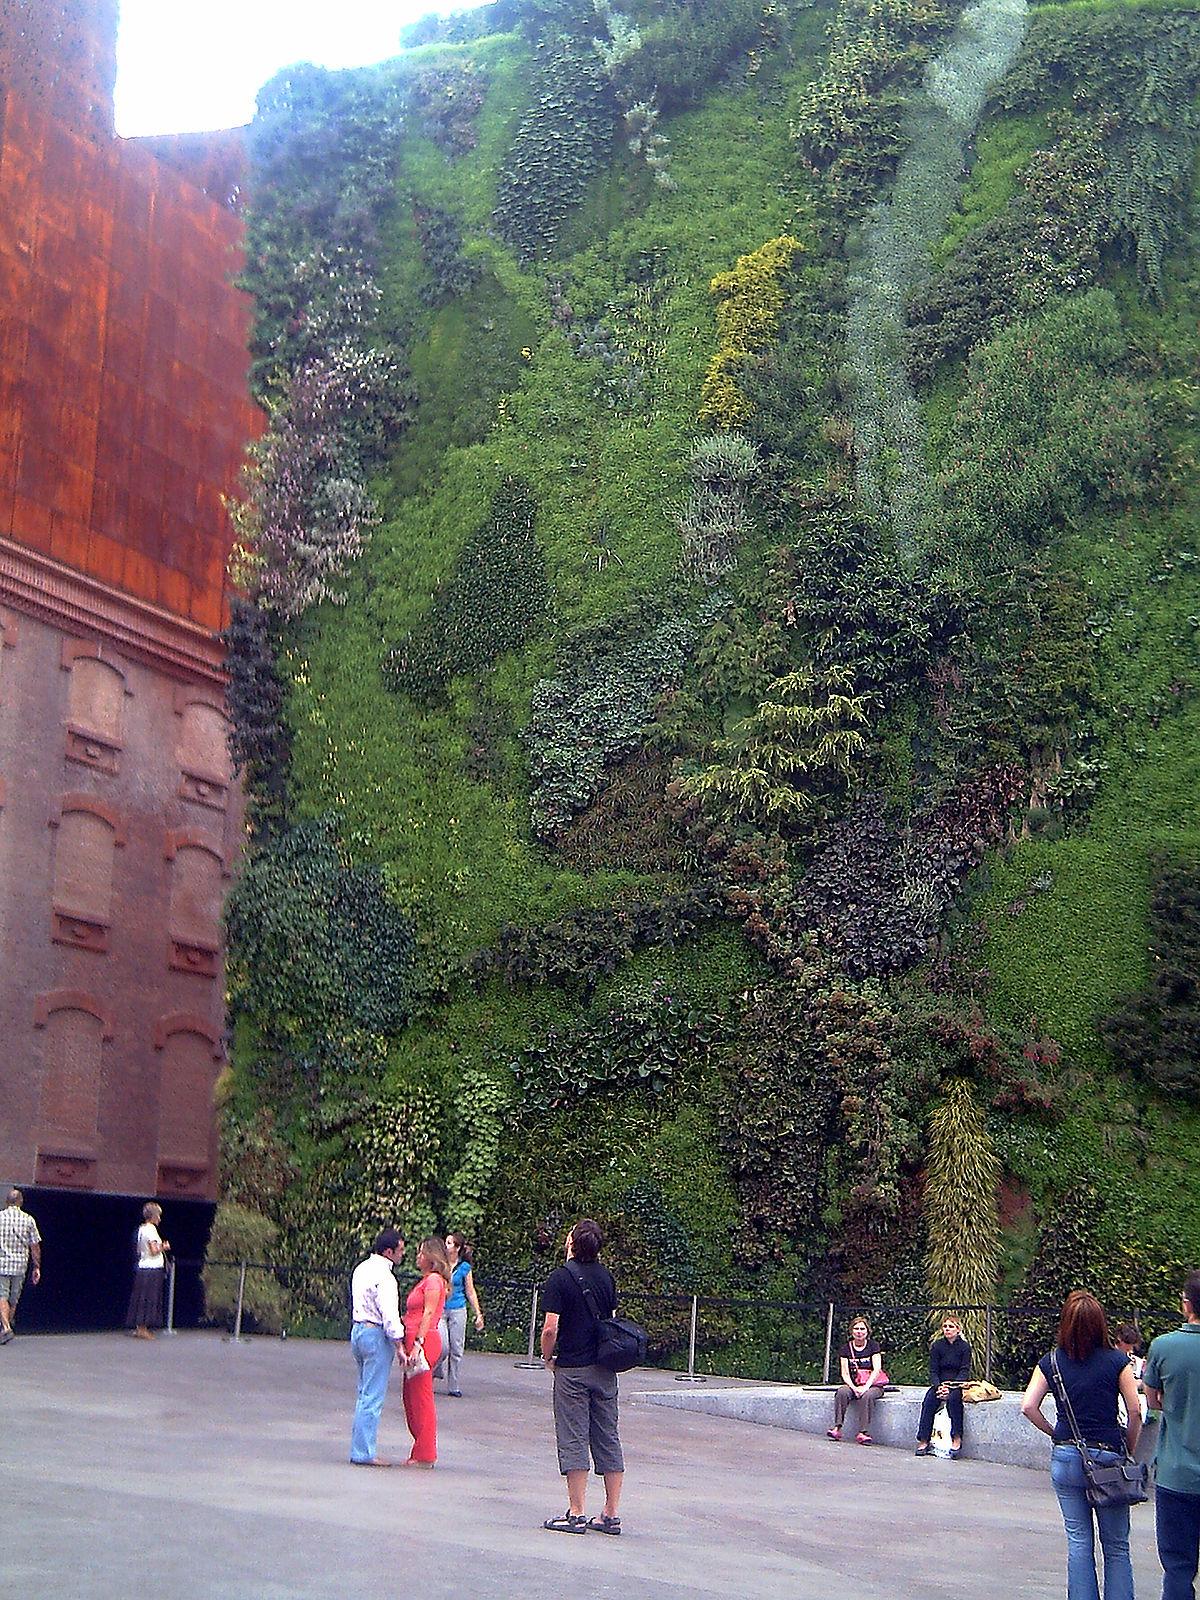 Pared de cultivo wikipedia la enciclopedia libre - Estructura jardin vertical ...